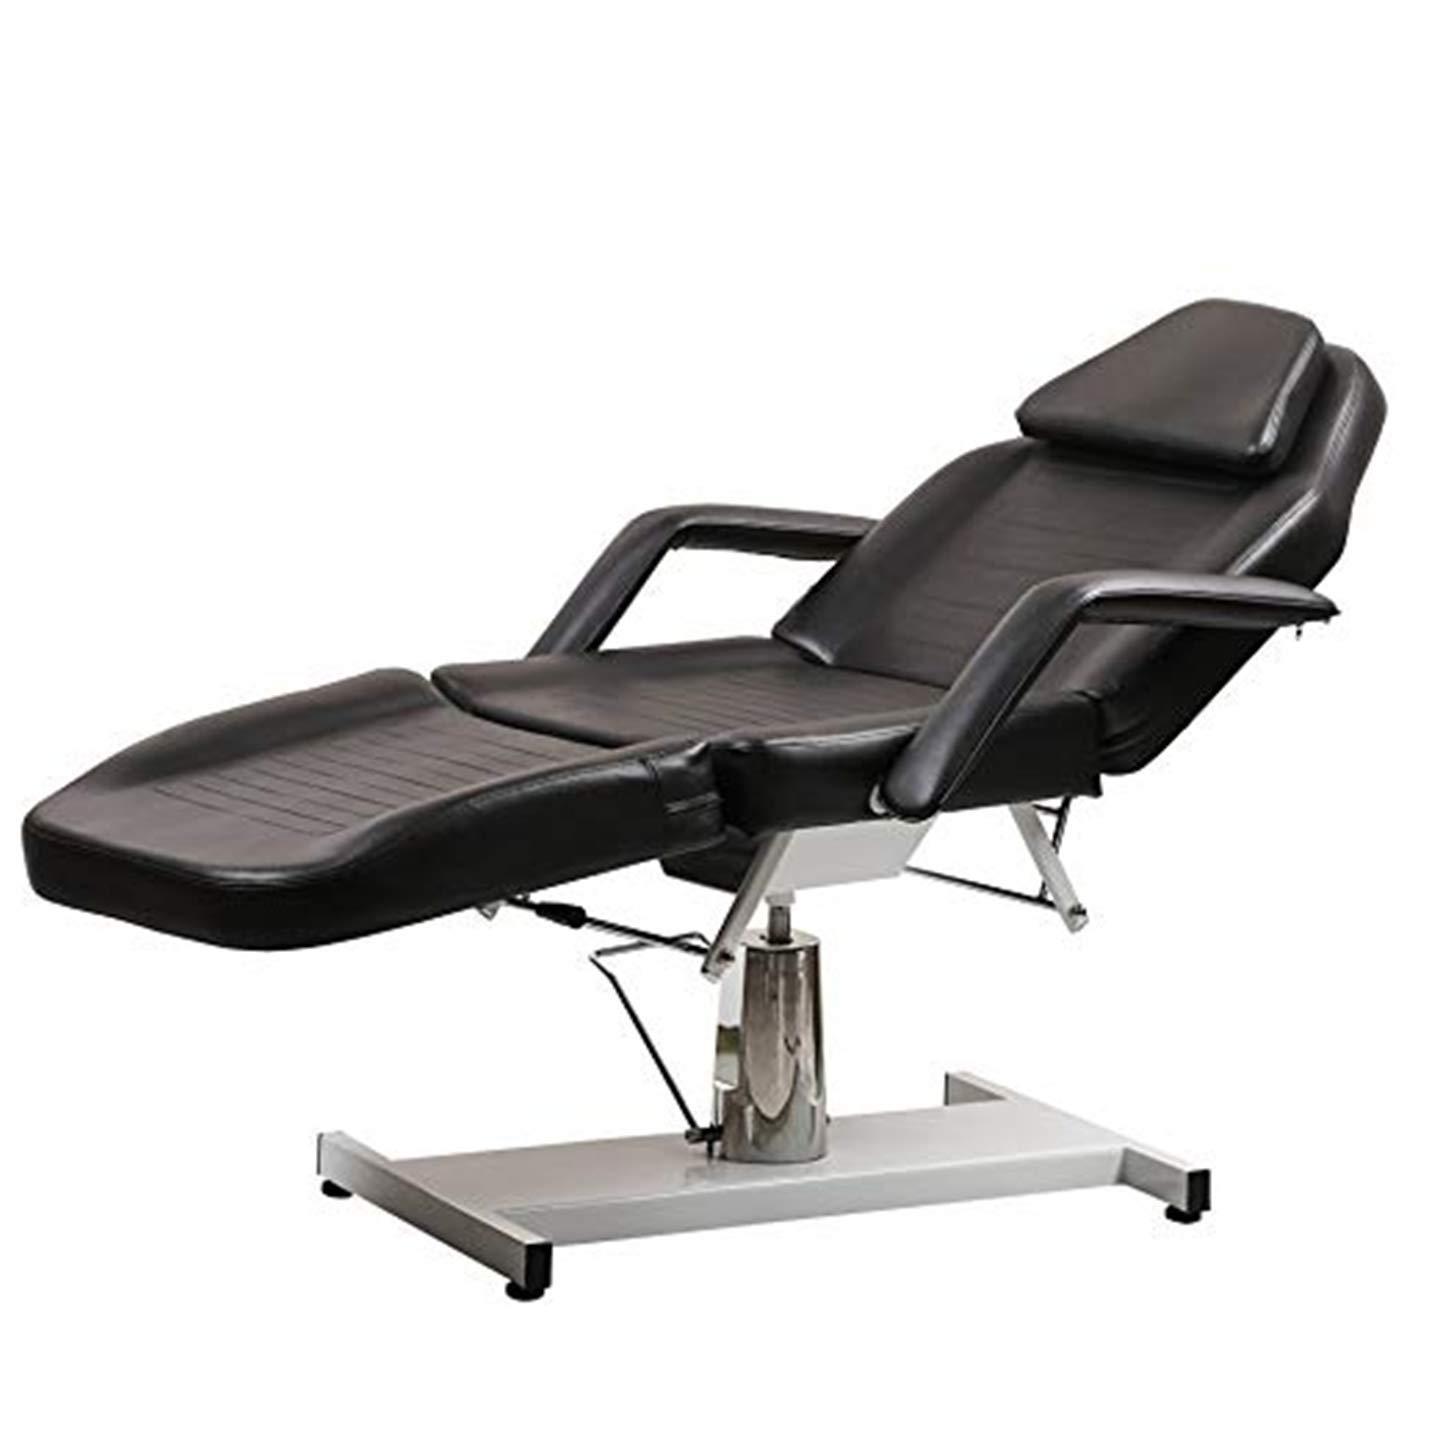 Salon Style Multi-function Adjustable Hydraulic Beauty Bed